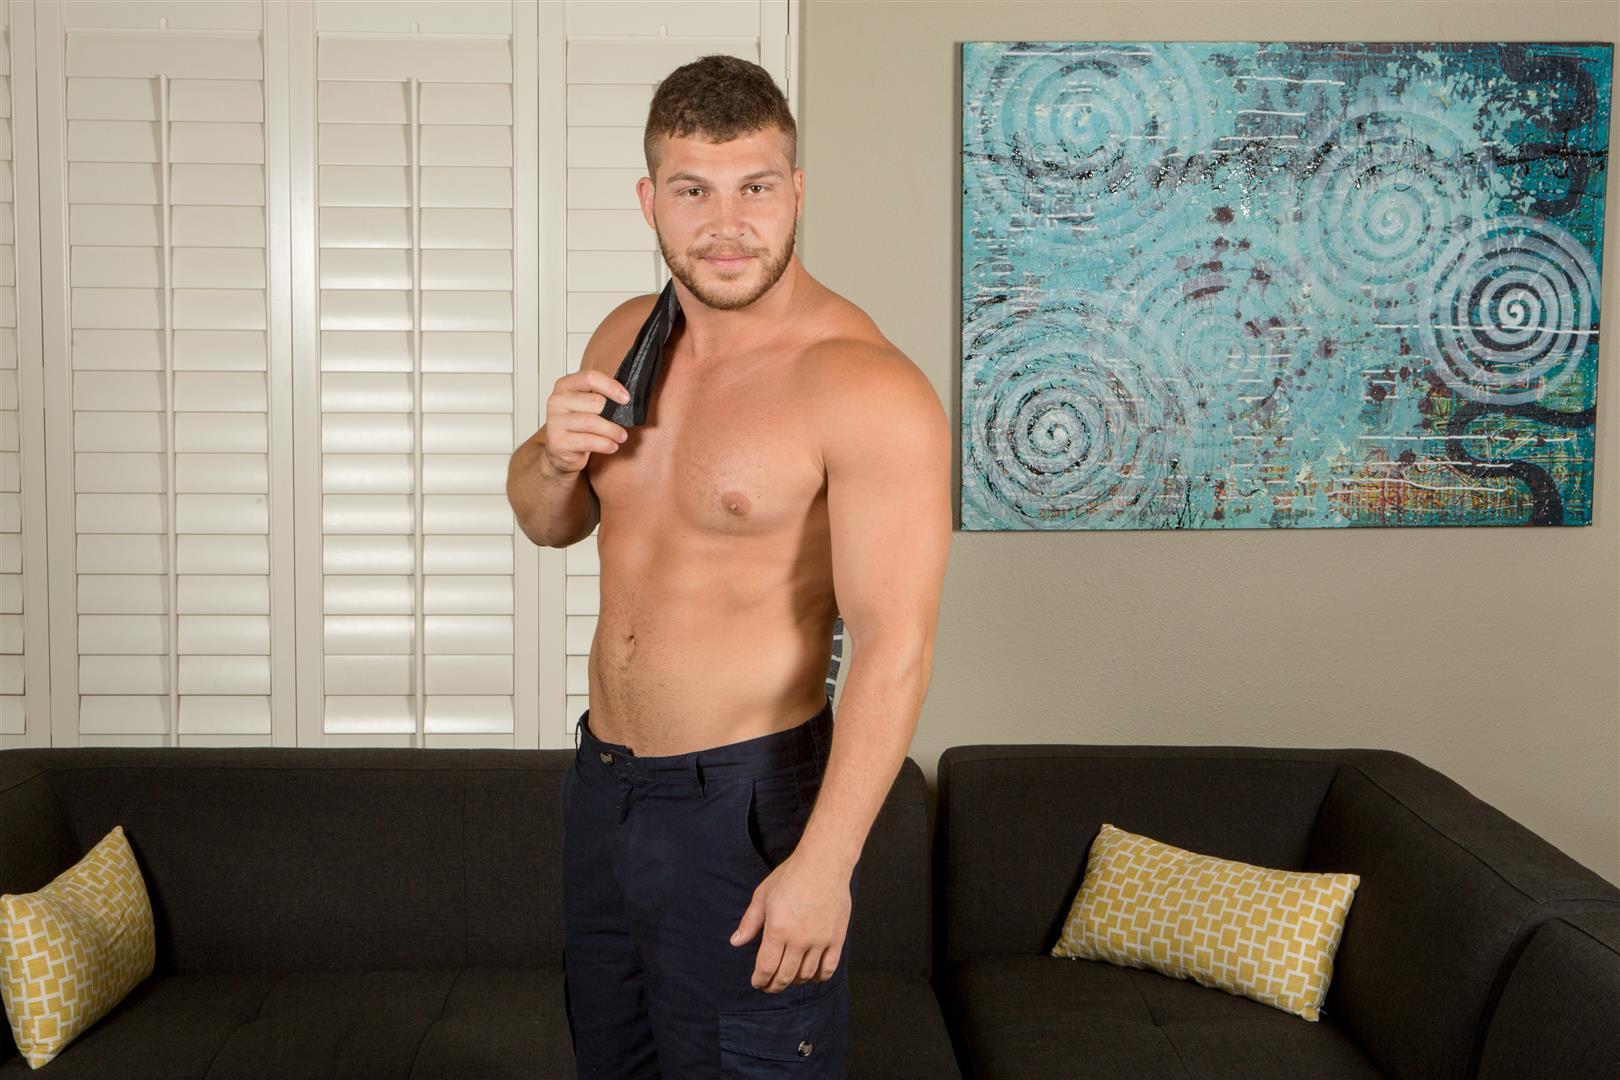 Sean-Cody-Jasper-and-Brodie-Straight-Guys-Fucking-Amateur-Gay-Porn-04 Sean Cody: Newcomer Jasper & Brodie Fucking Bareback